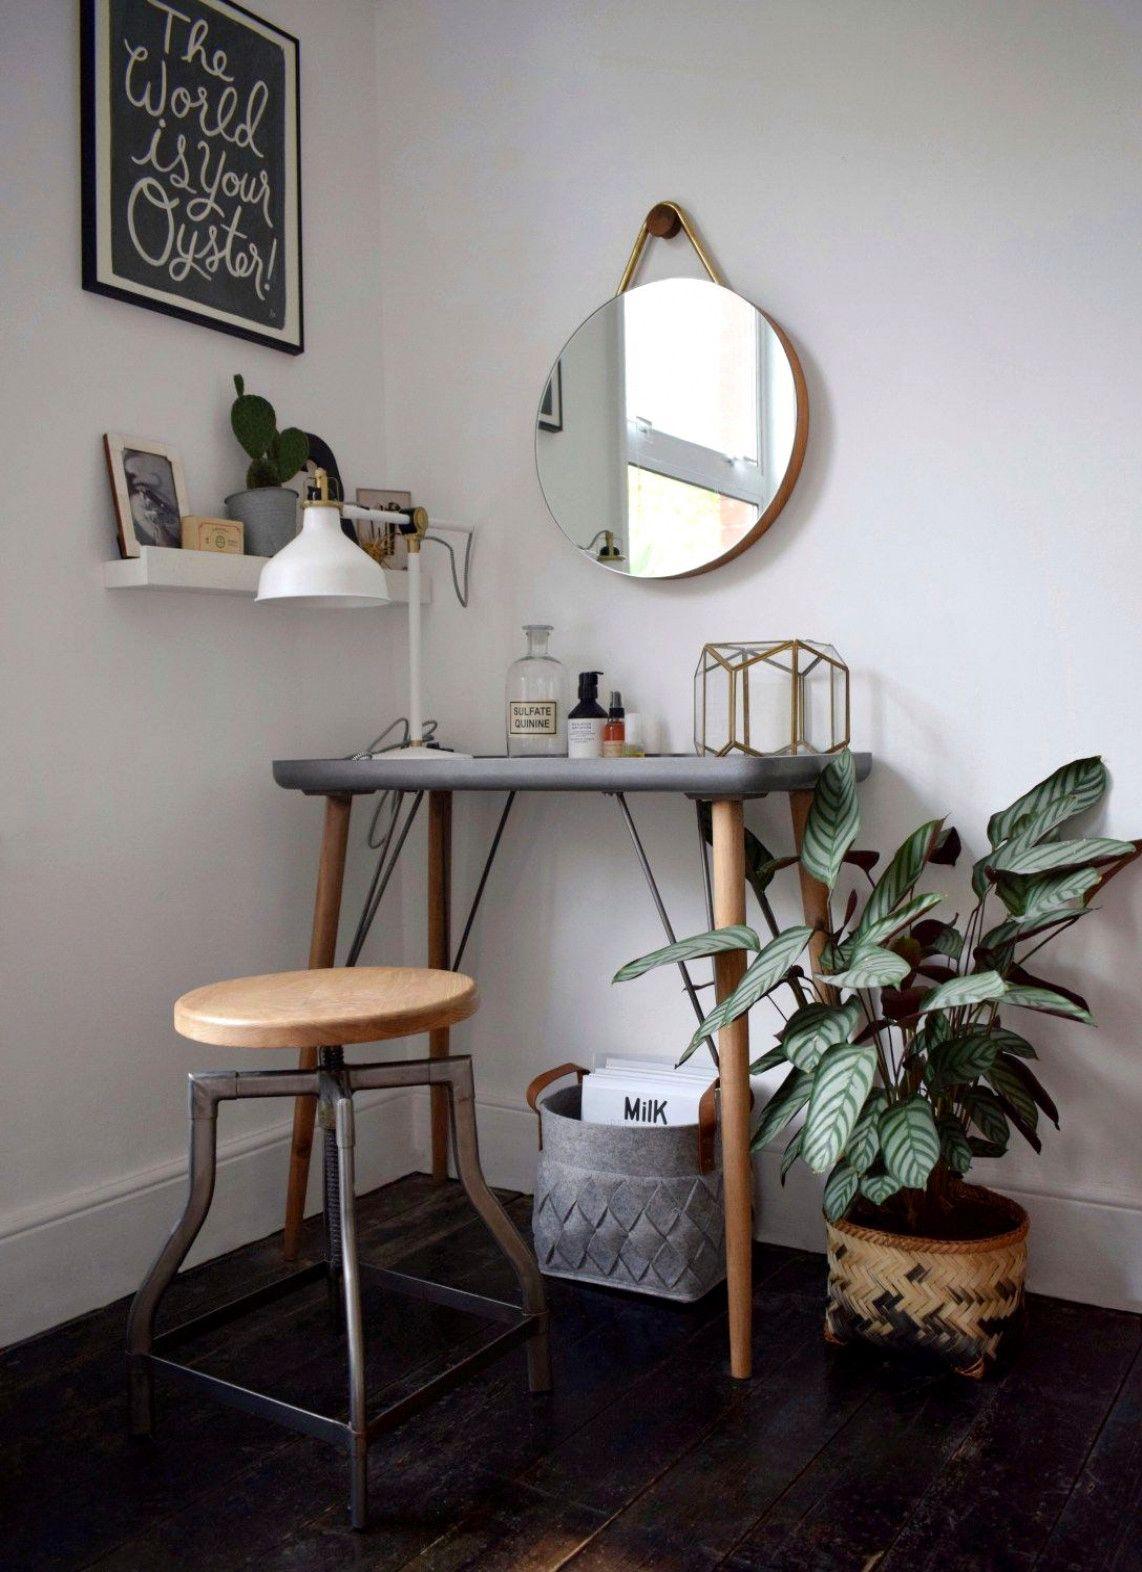 Scandinavian Rustic Bohemian White Nordic Plants Minimalist Hygge Bedroom Bedroom Bedroom Interior Minimalist Bedroom Design Home Decor Bedroom